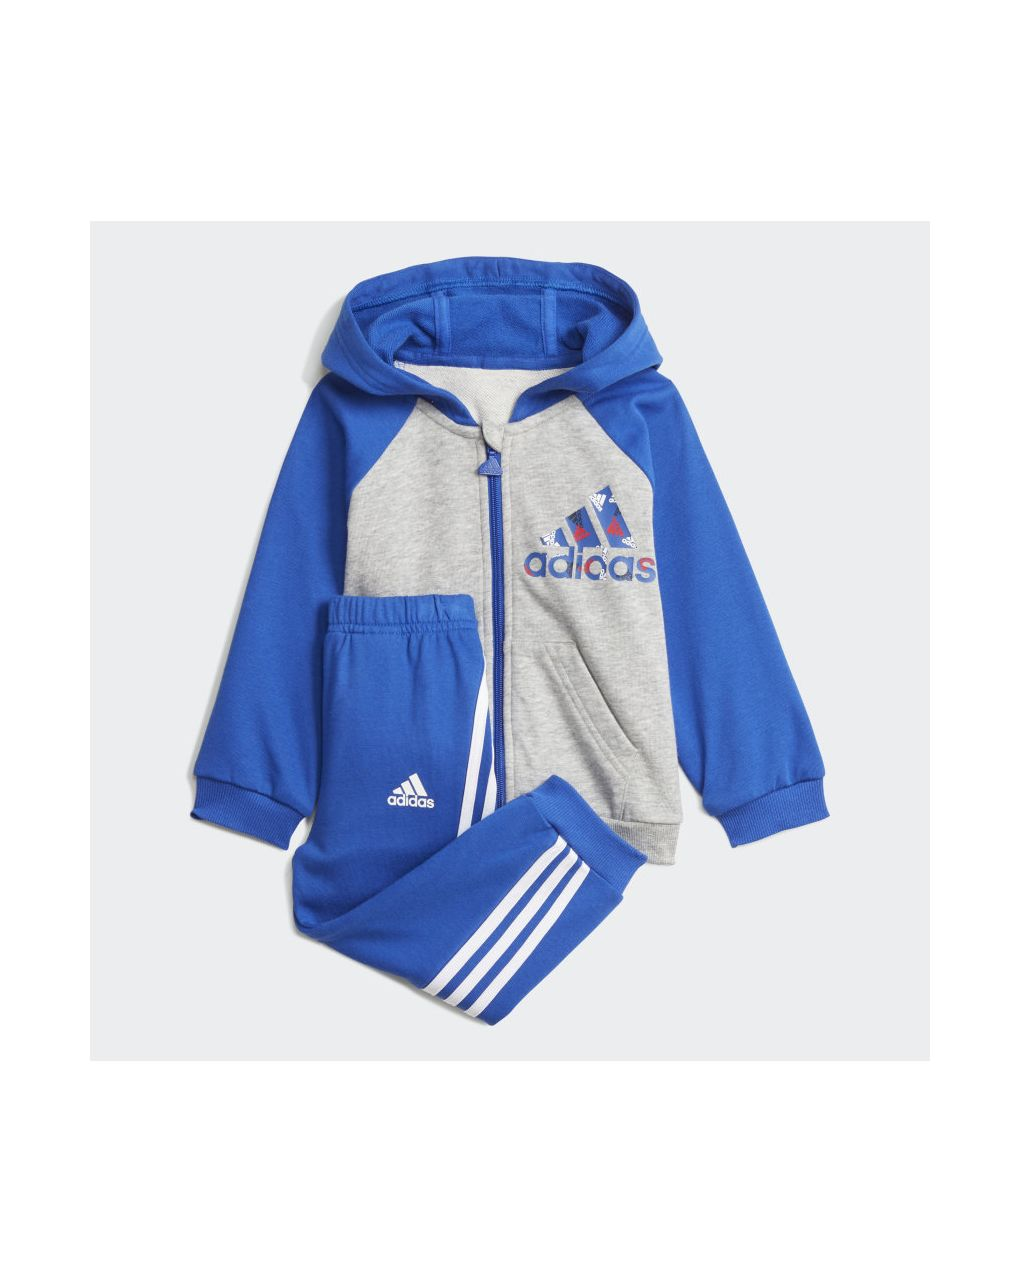 Adidas Σετ Φόρμας Badge of Sport Full Μπλε για Αγόρι H28829